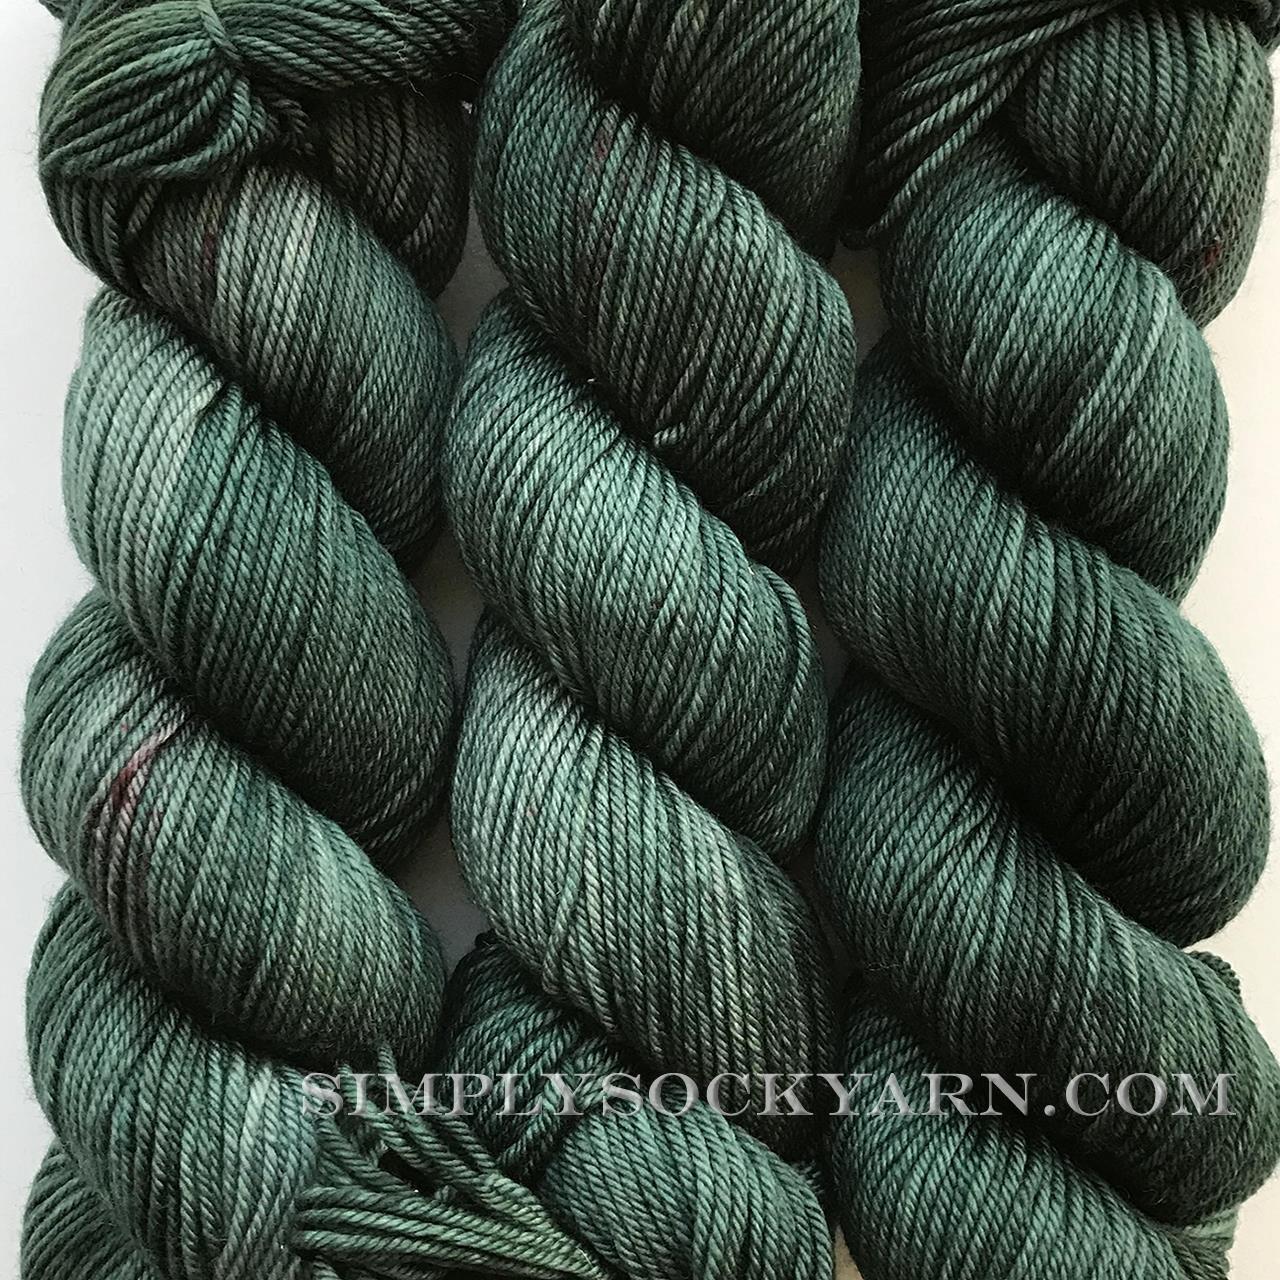 LITLG DK Twist Emerald Eve -